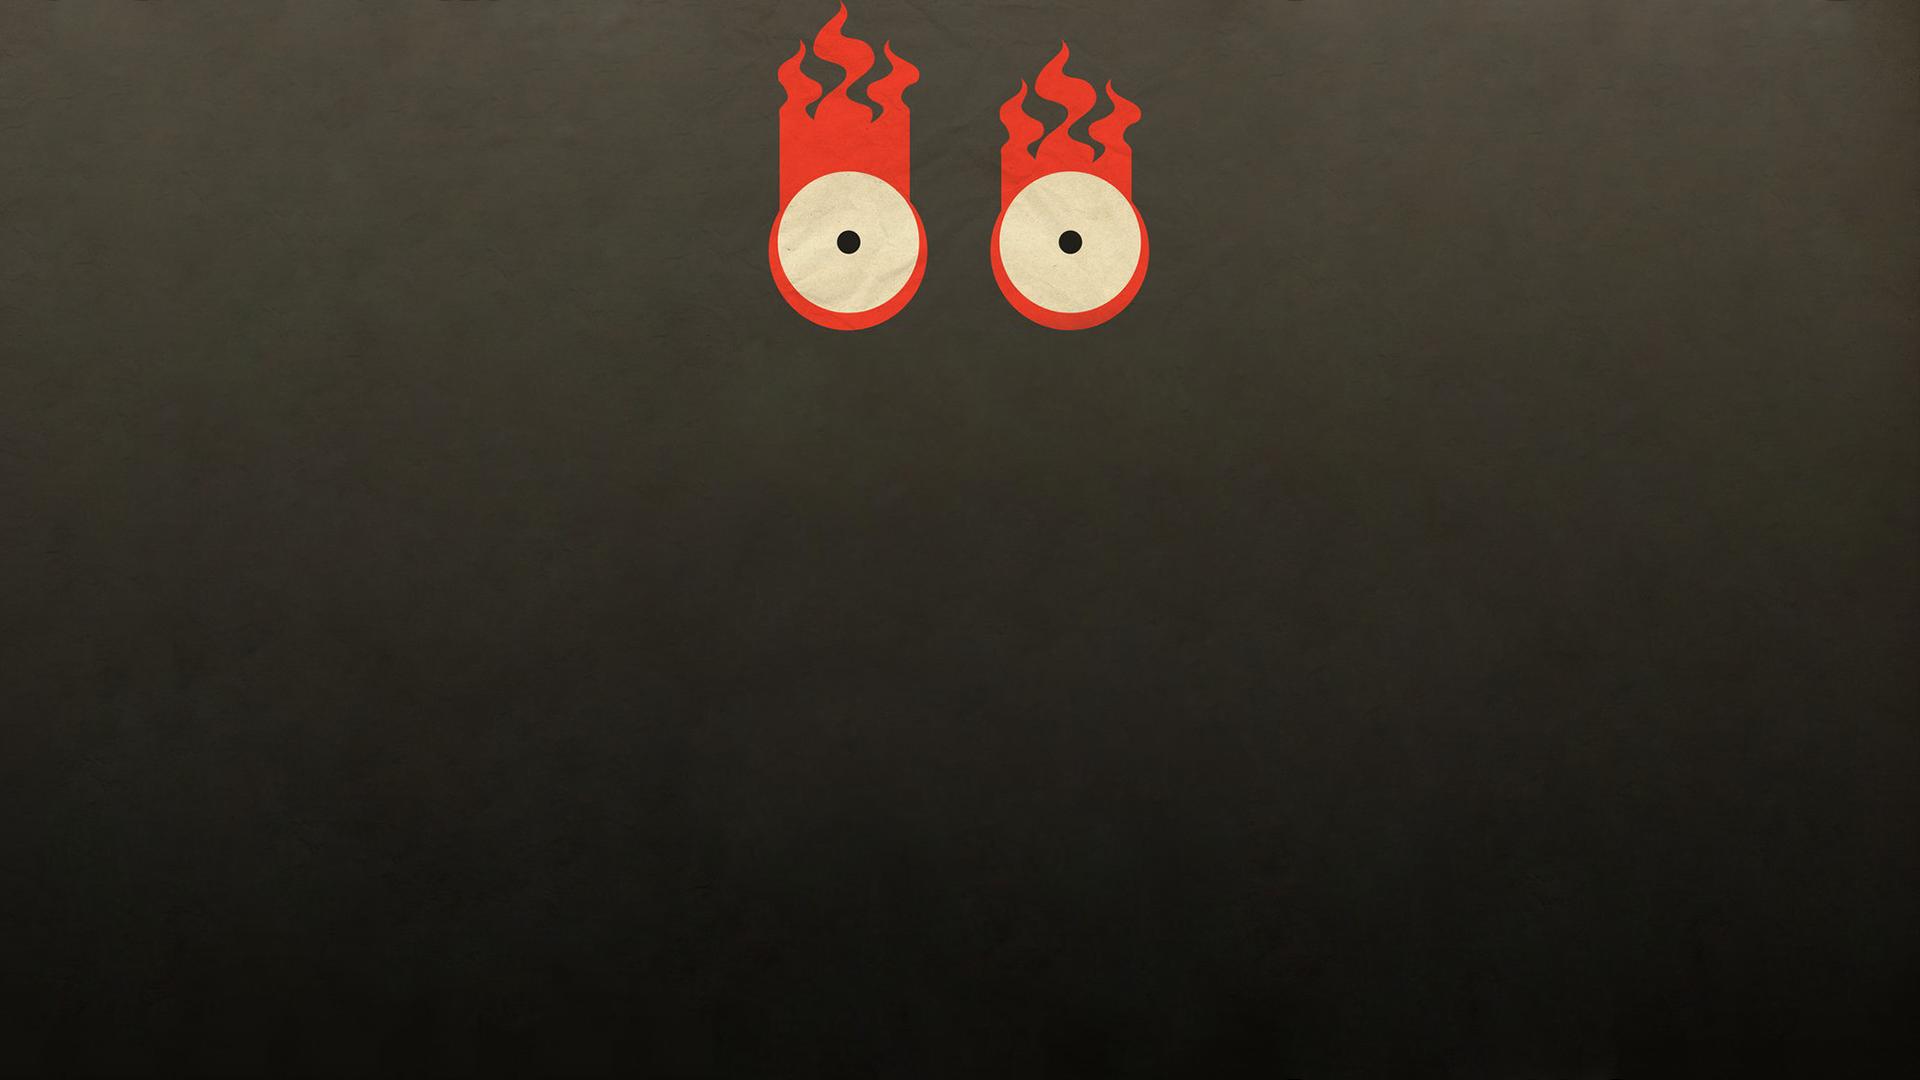 … augustohirakodias Samurai Jack – A Kickass Wallpaper (Model) by  augustohirakodias